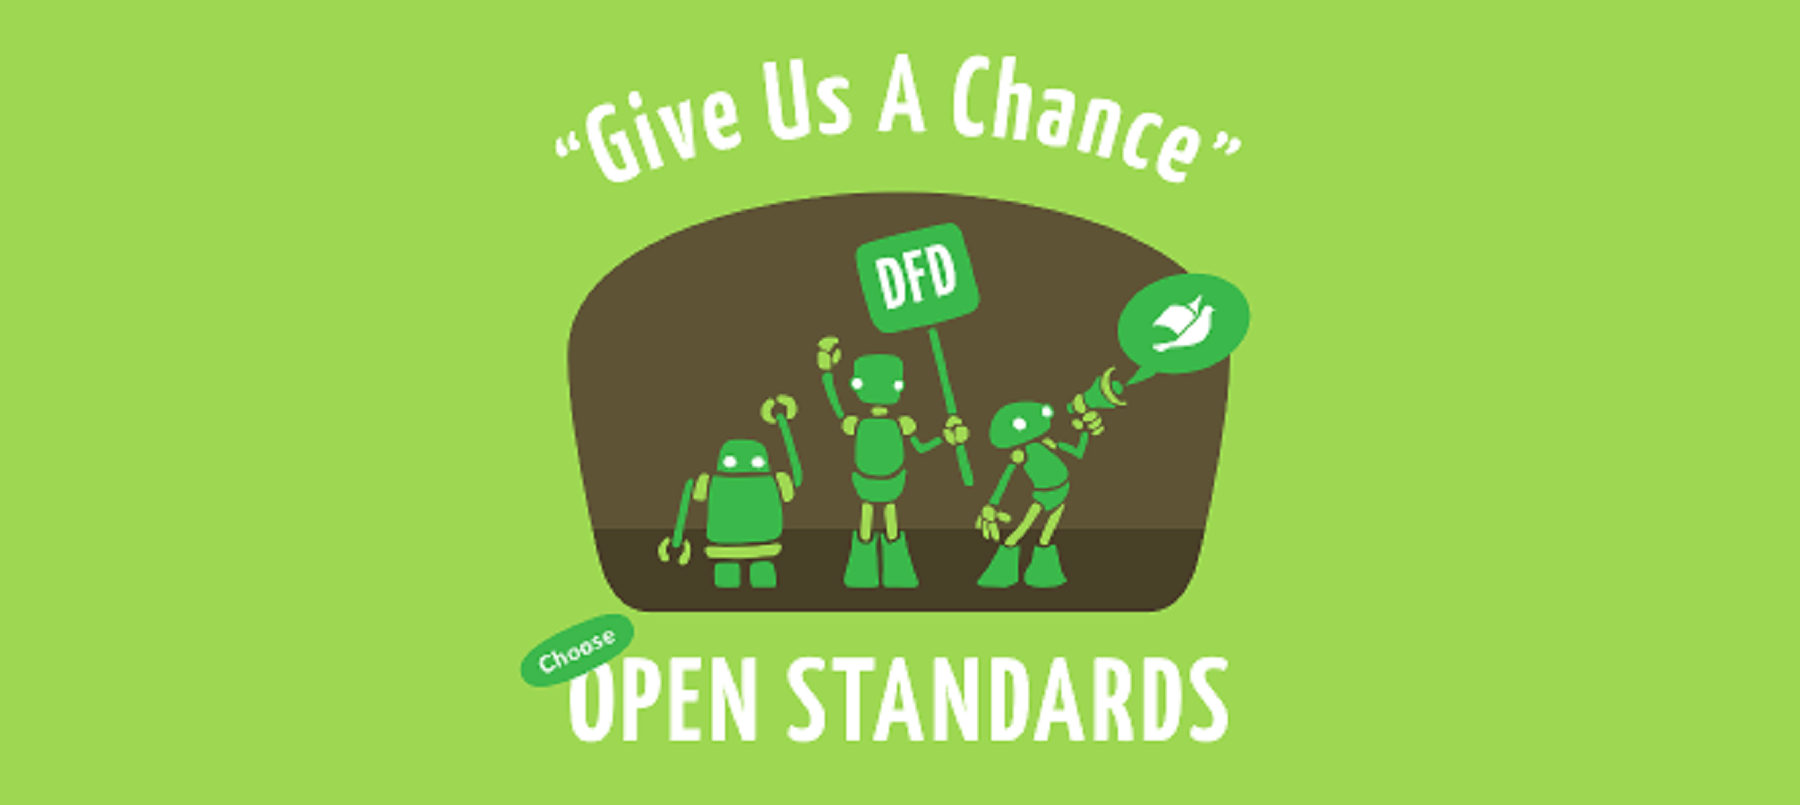 open standard